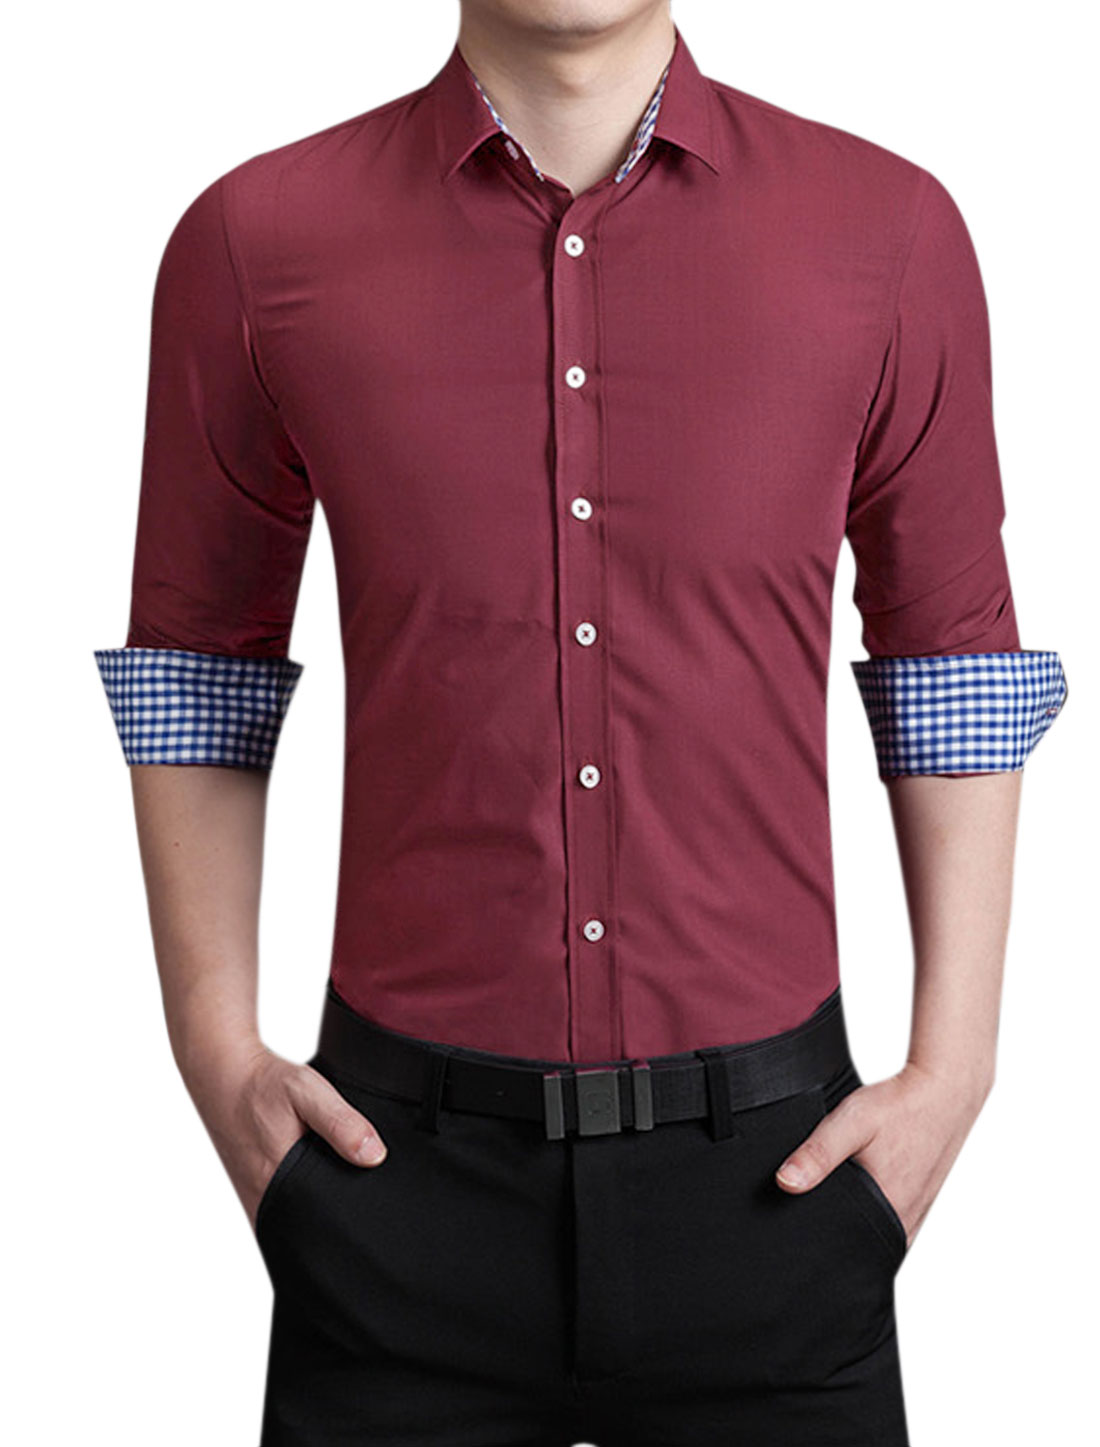 Men Long Sleeves Point Collar Slim Fit Dress Shirt Red M